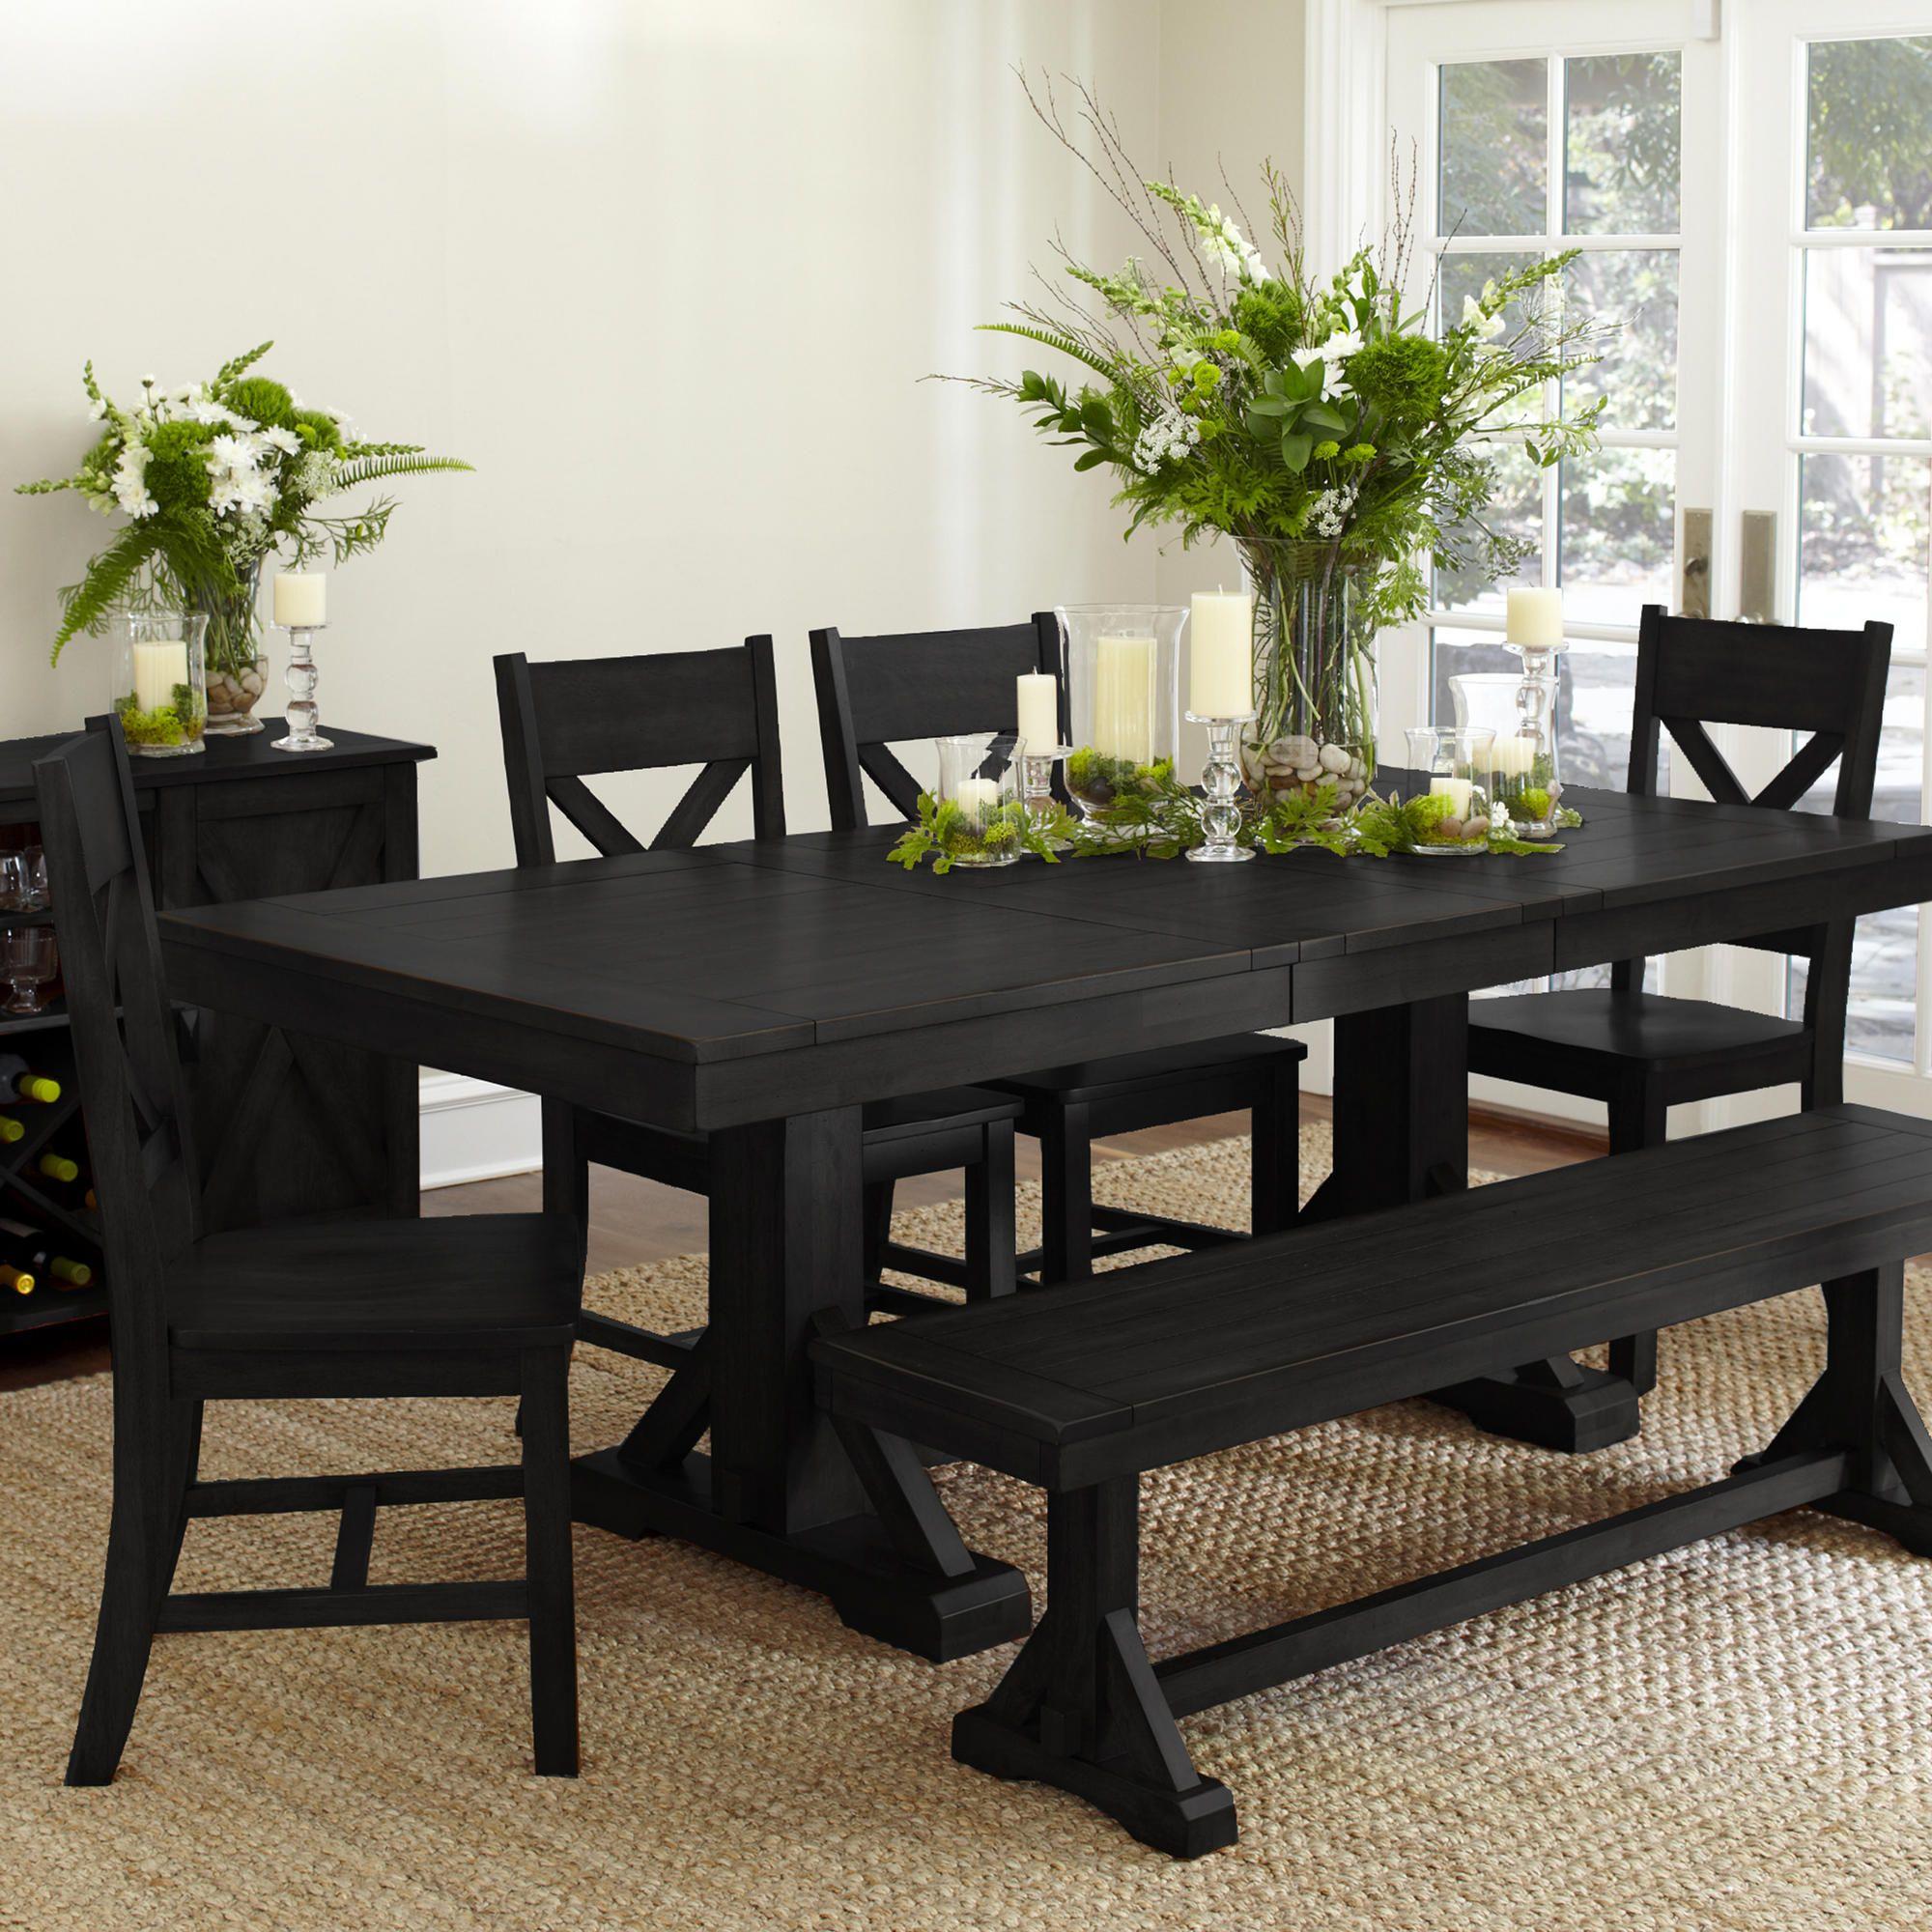 Astounding Antique Black Verona Dining Collection Dining Room Ibusinesslaw Wood Chair Design Ideas Ibusinesslaworg